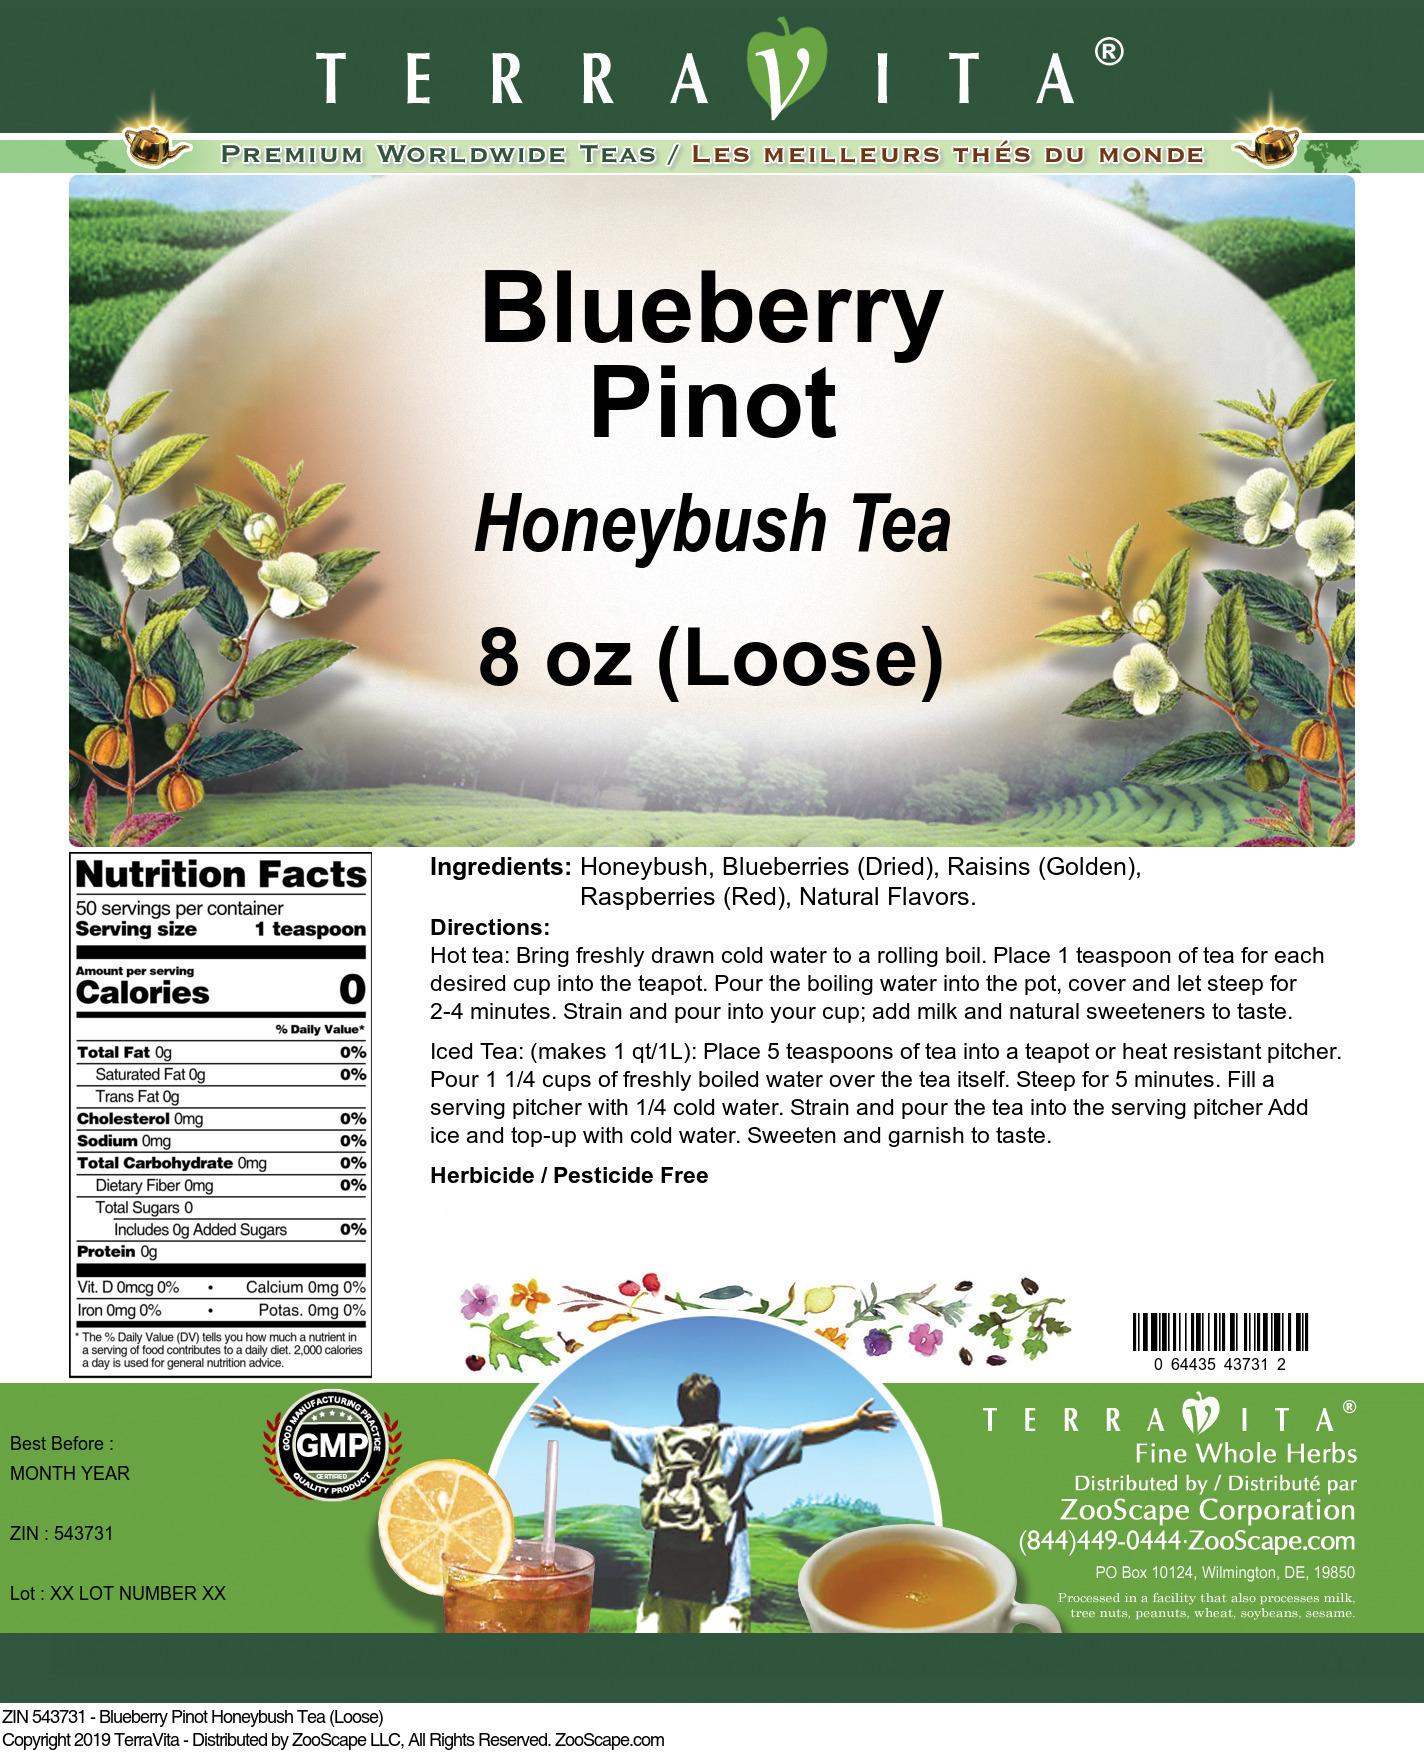 Blueberry Pinot Honeybush Tea (Loose)